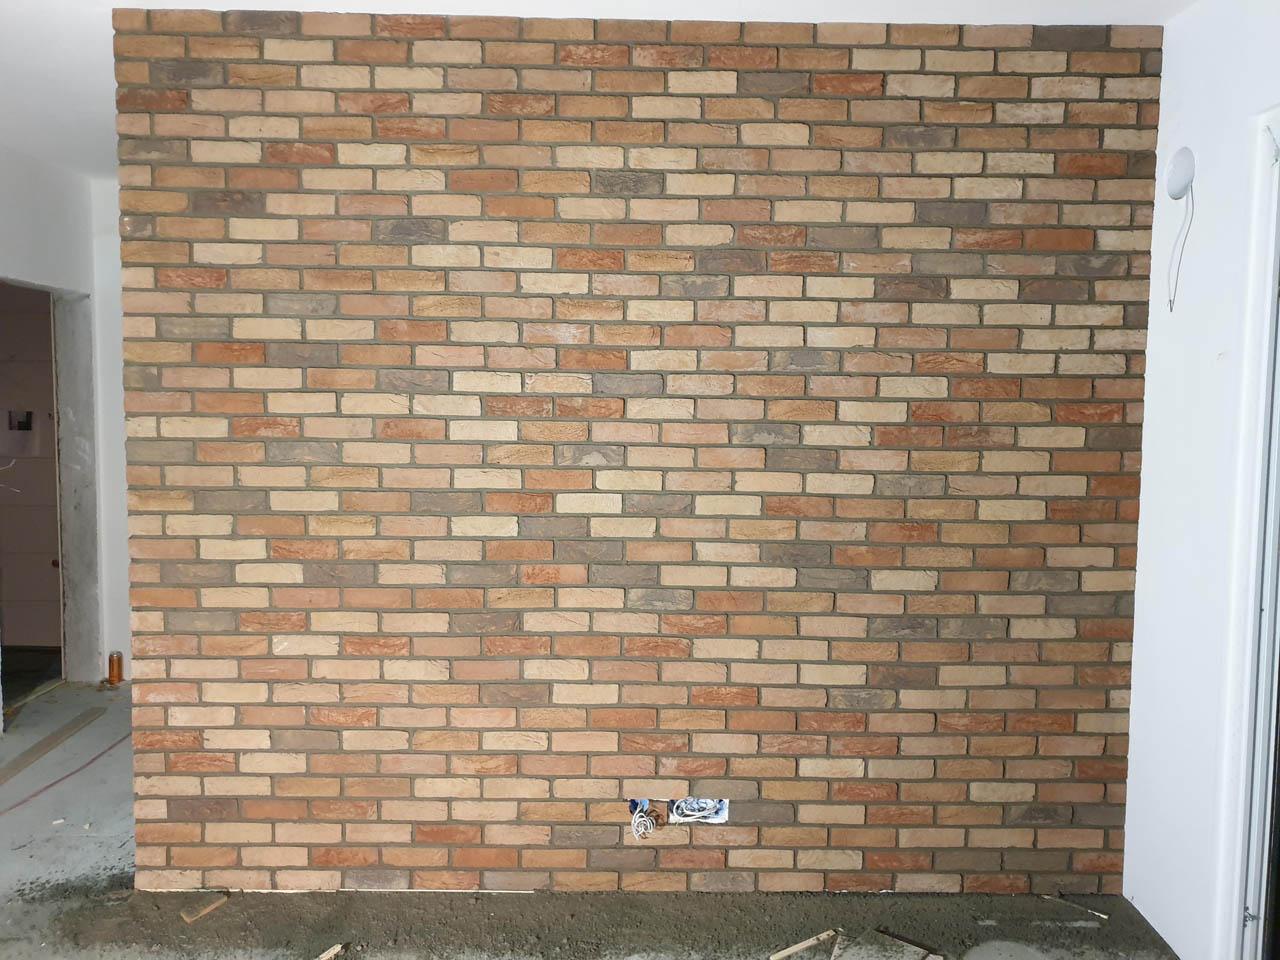 Dekorativna opeka na steni